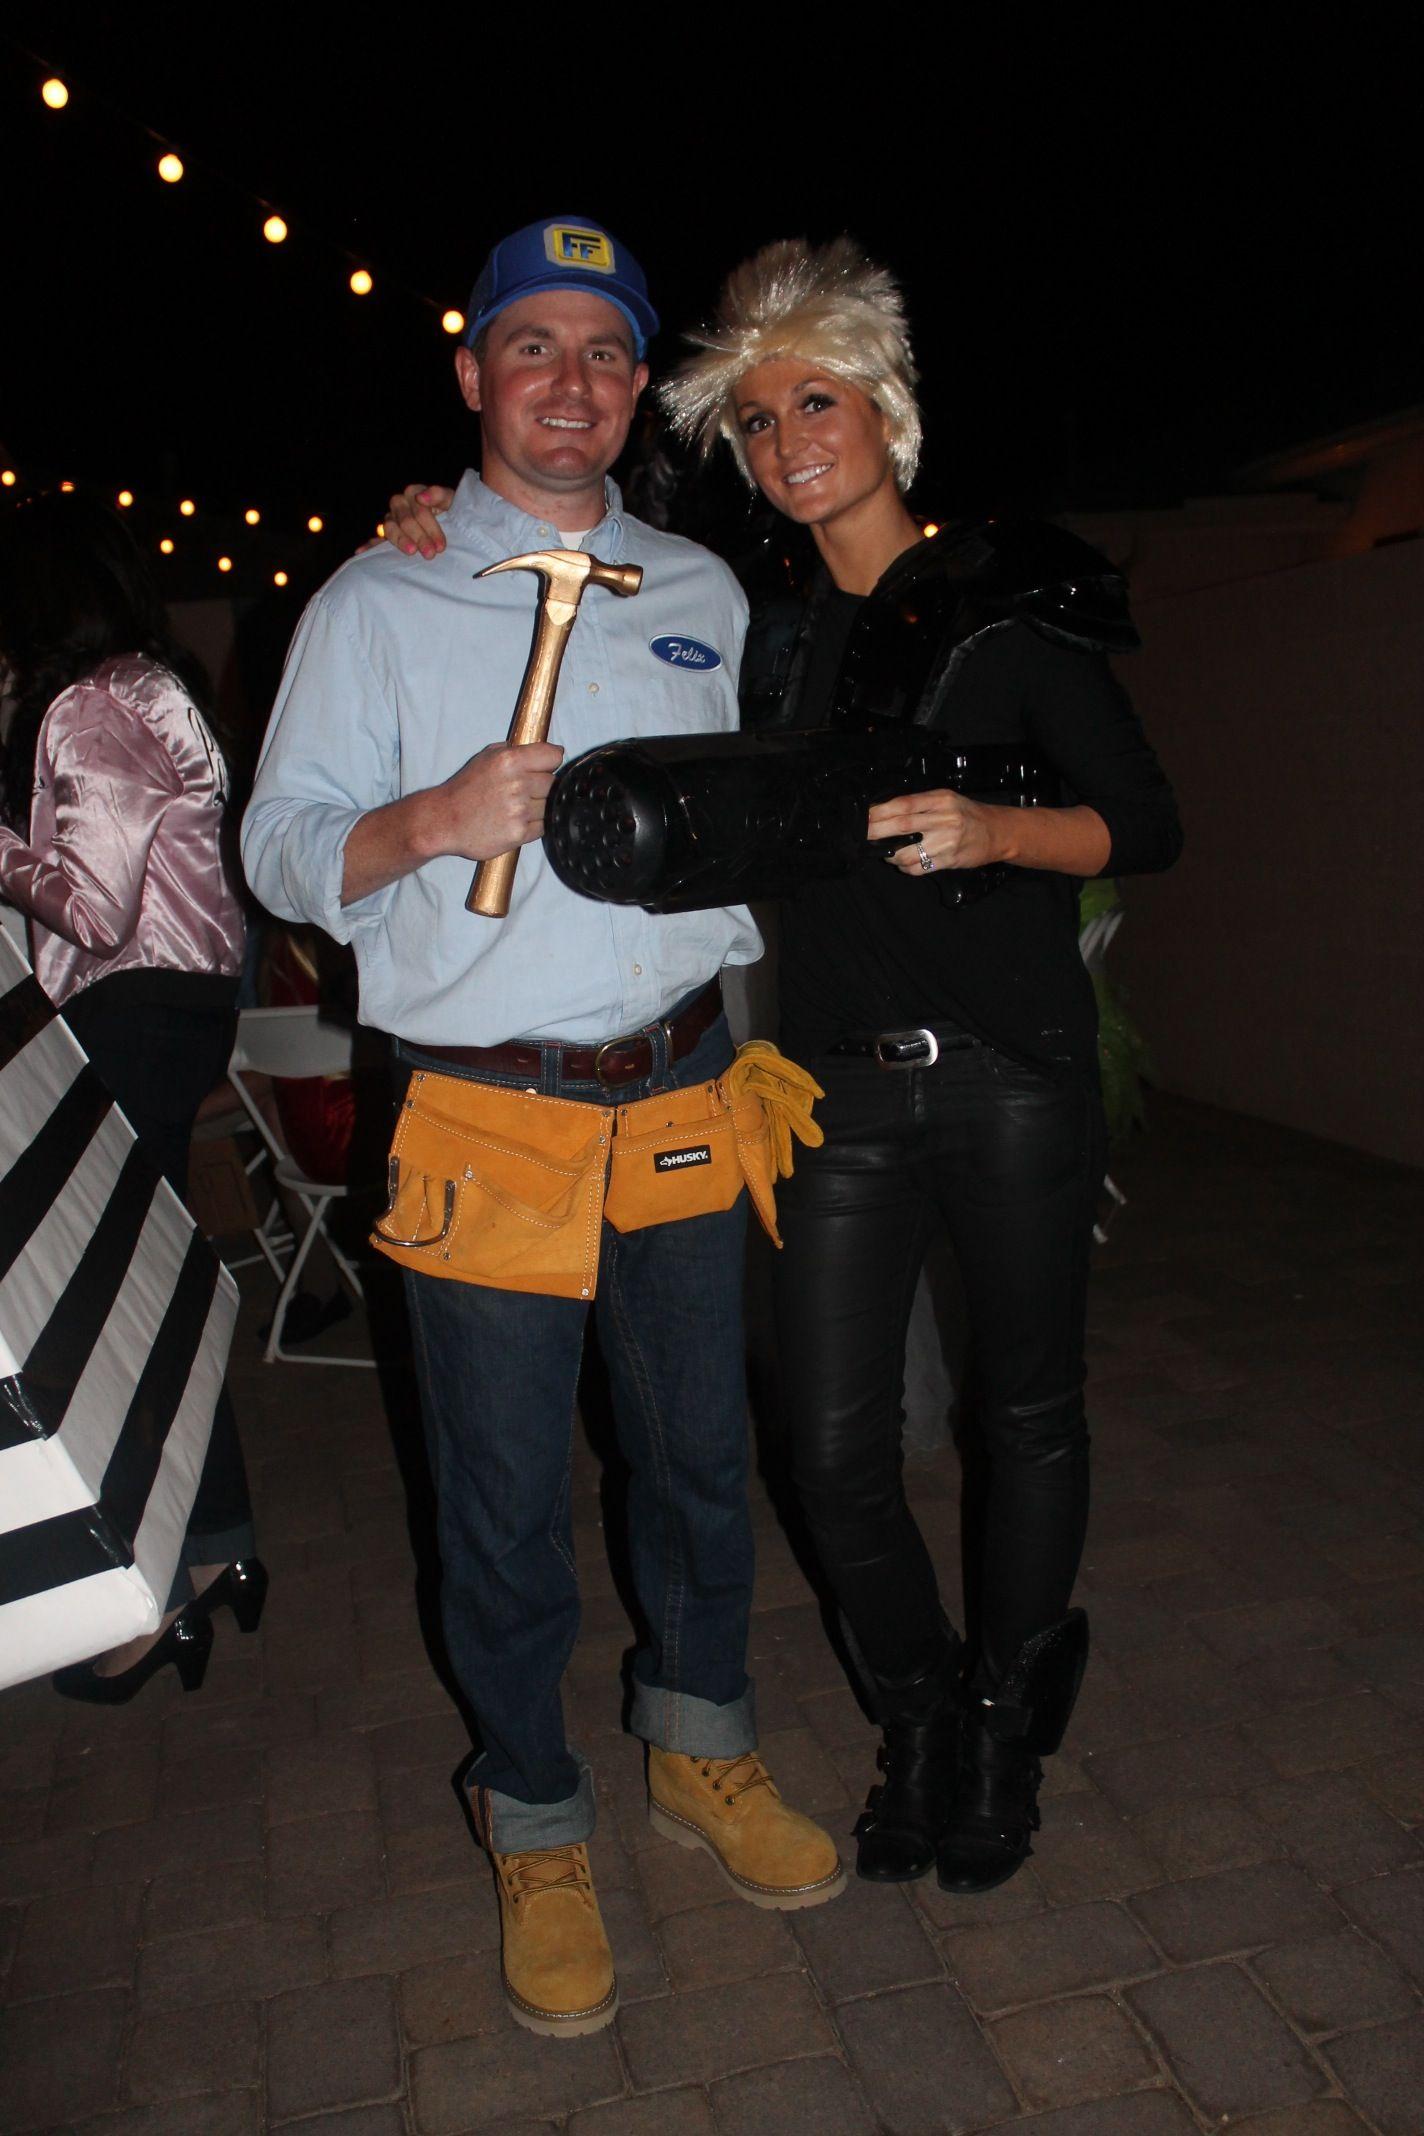 creative award winning halloween costume ideas - Halloween Winning Costumes